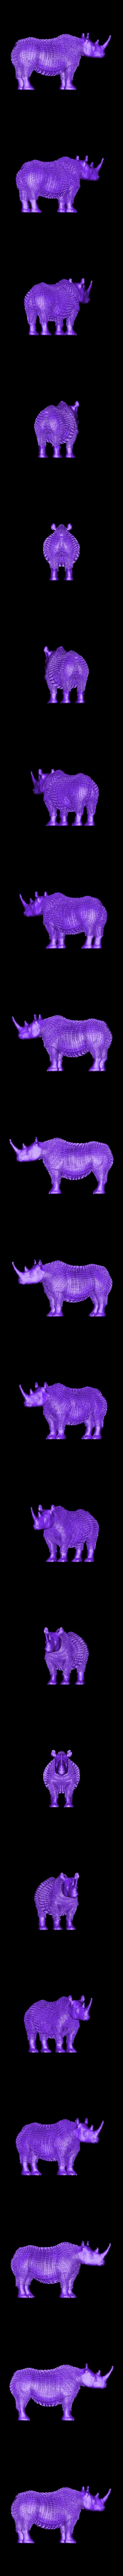 rhinoceros.stl Download free STL file rhinoceros • Model to 3D print, chauvinxavier